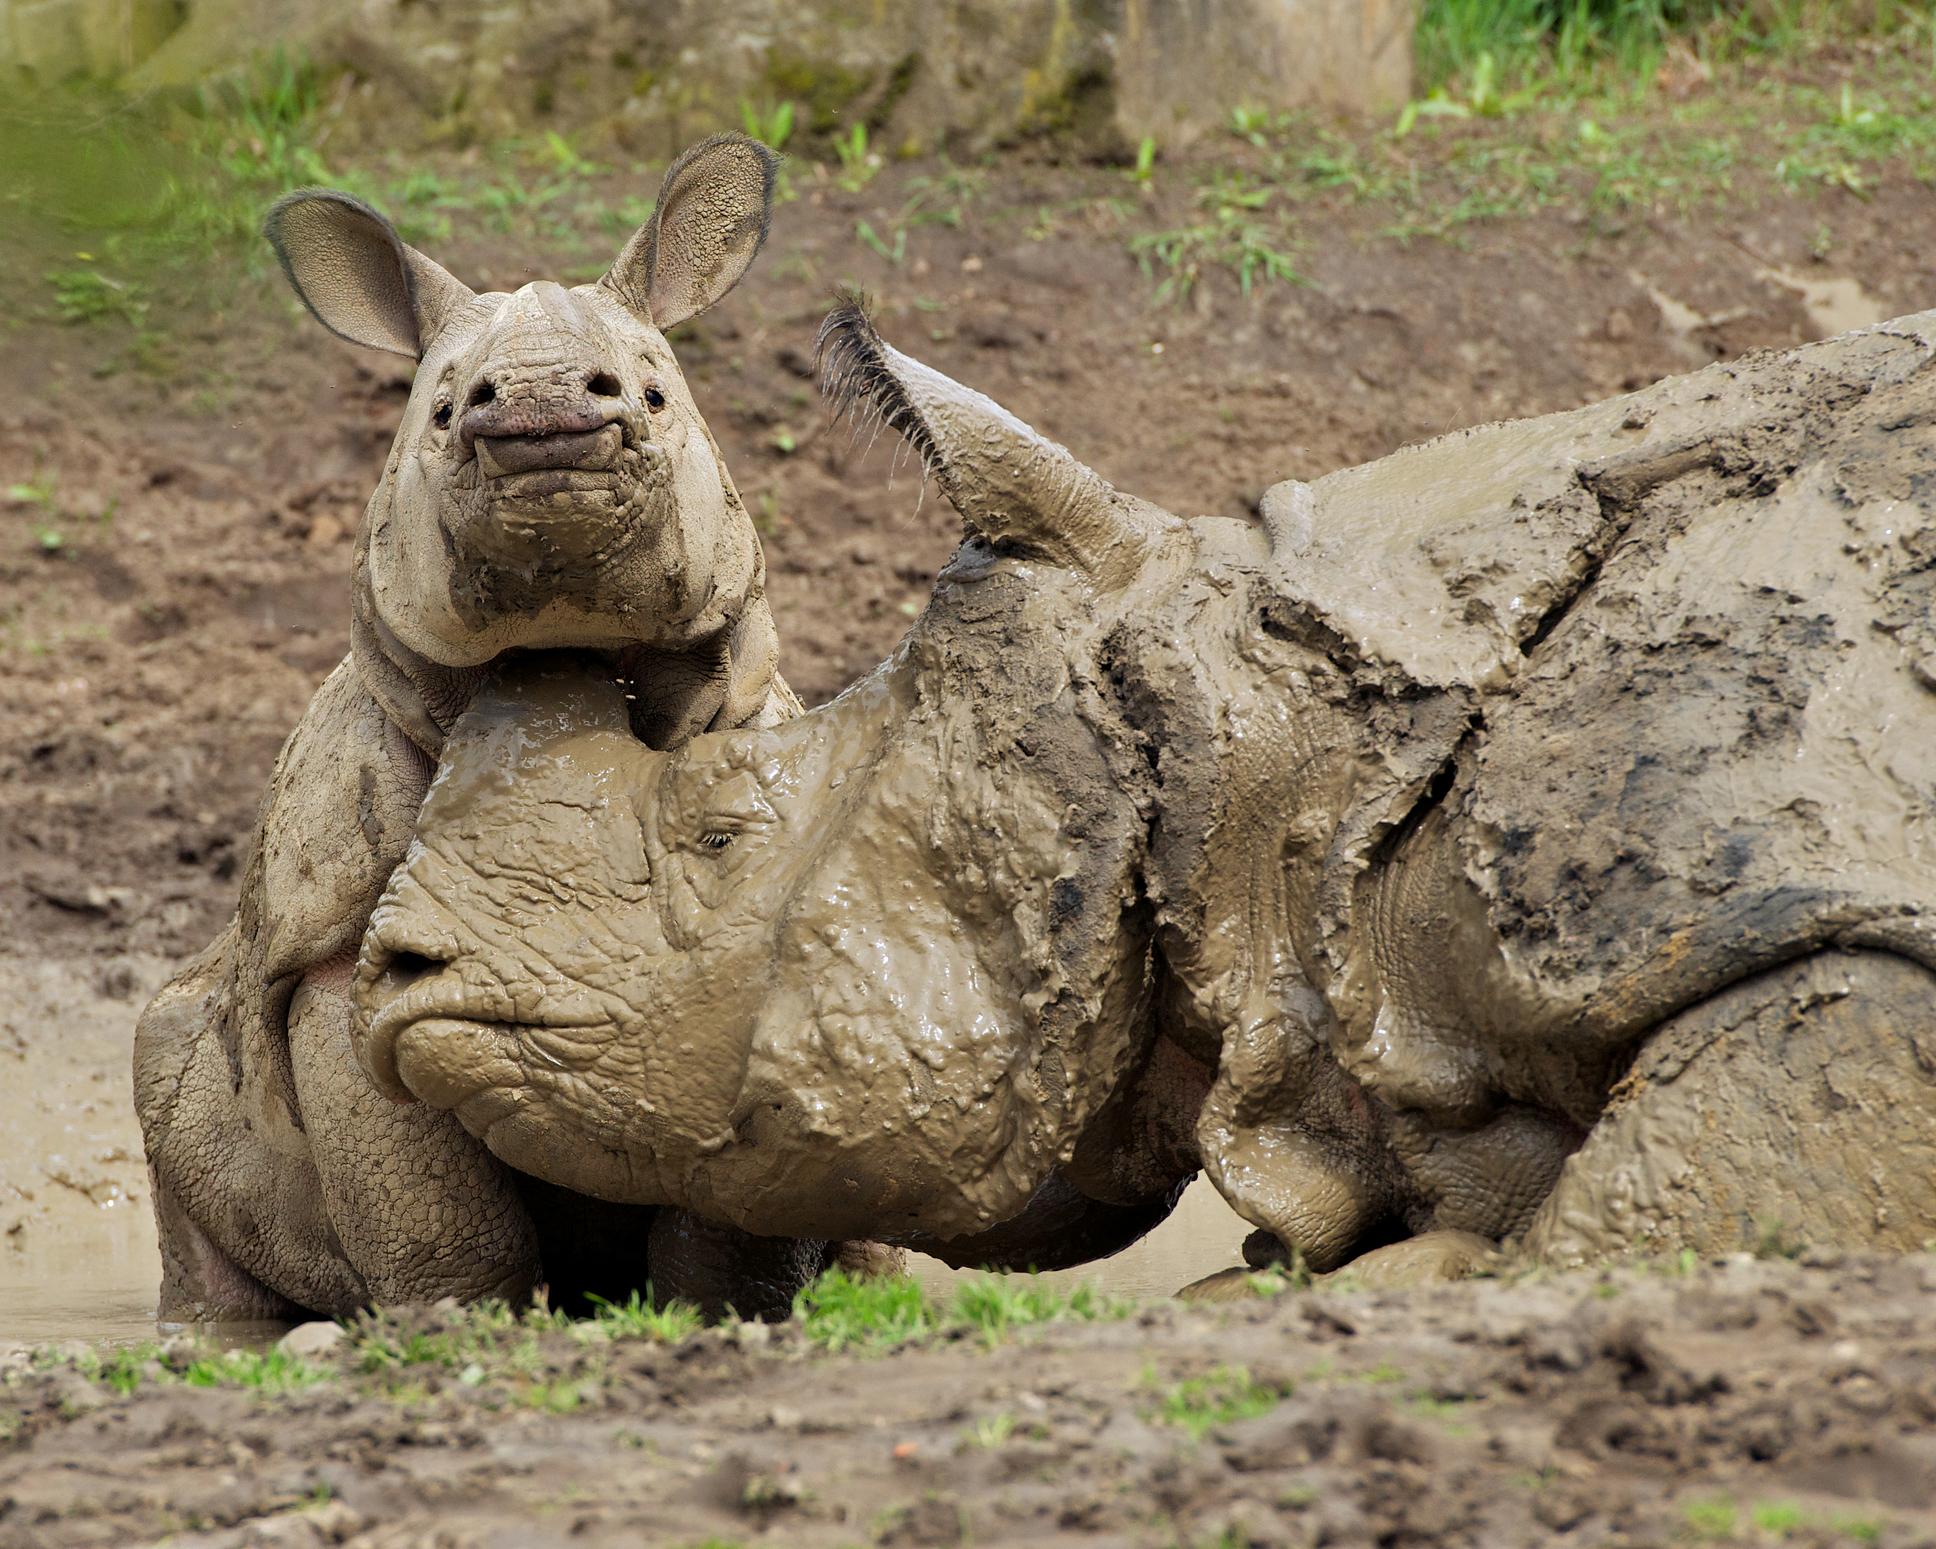 indian-rhino-calf-and-cow-mud_dreamstime